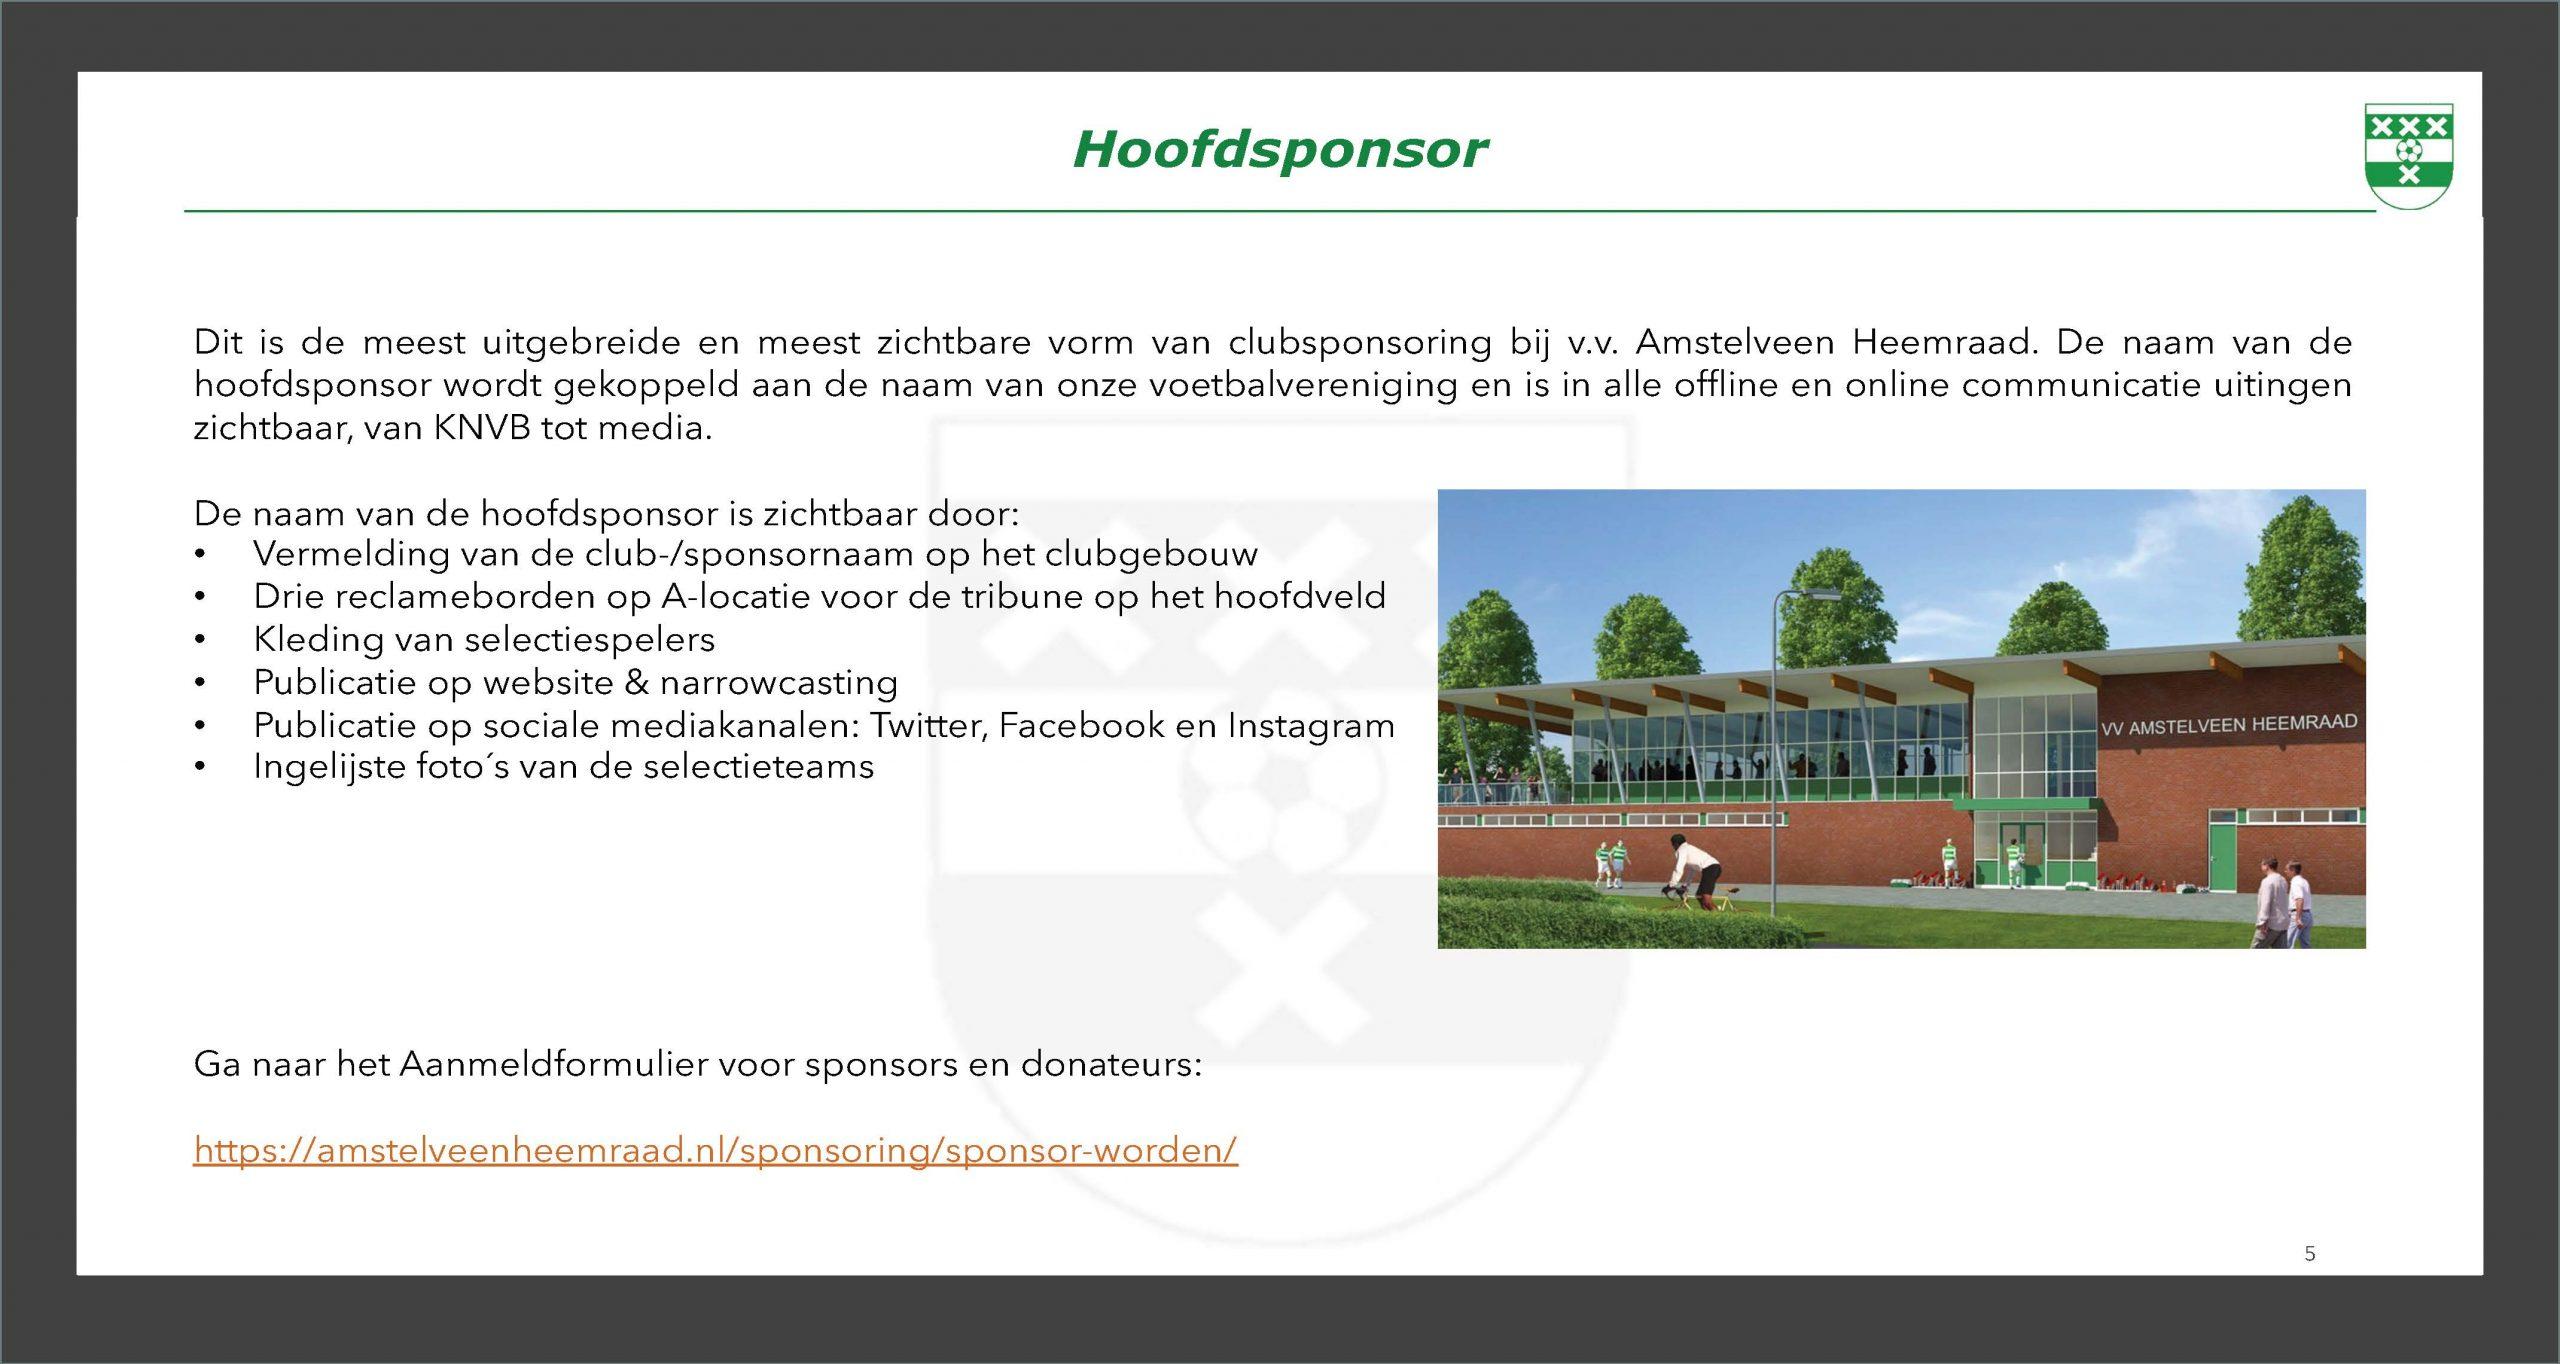 Sponsorplan 2020-2021 DEF_pagina5